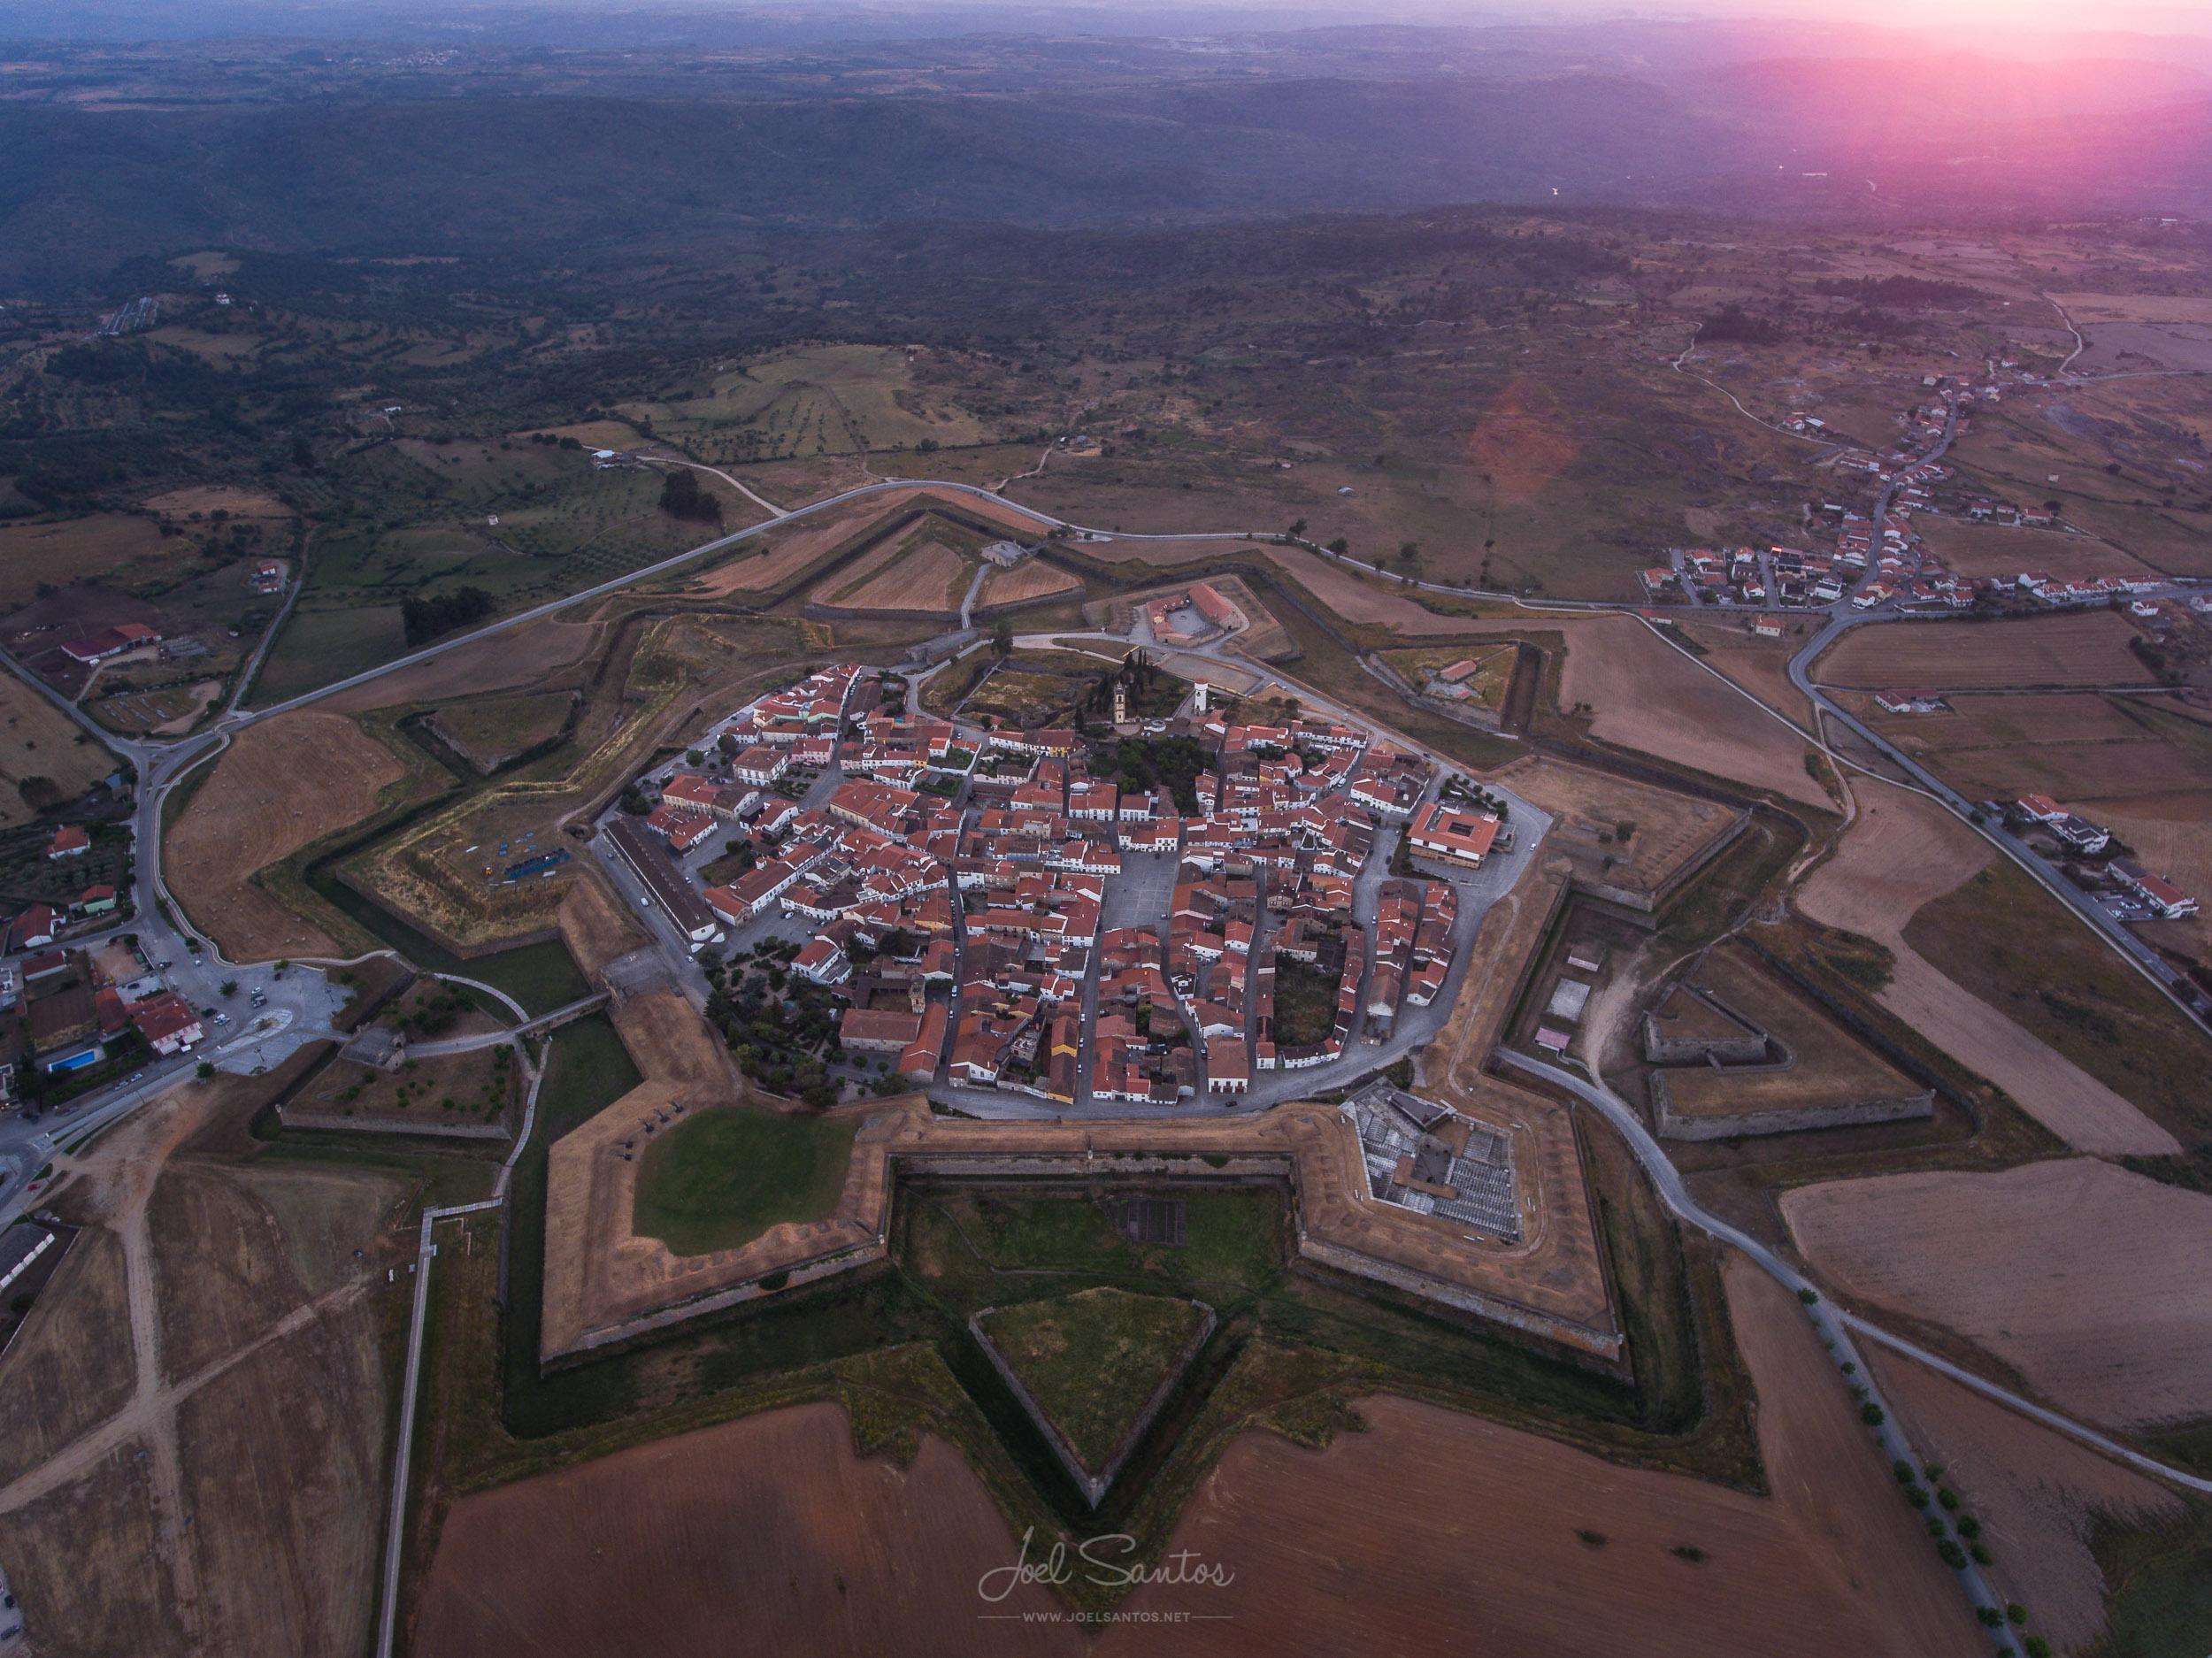 Almeida fortress, Alentejo, Portugal